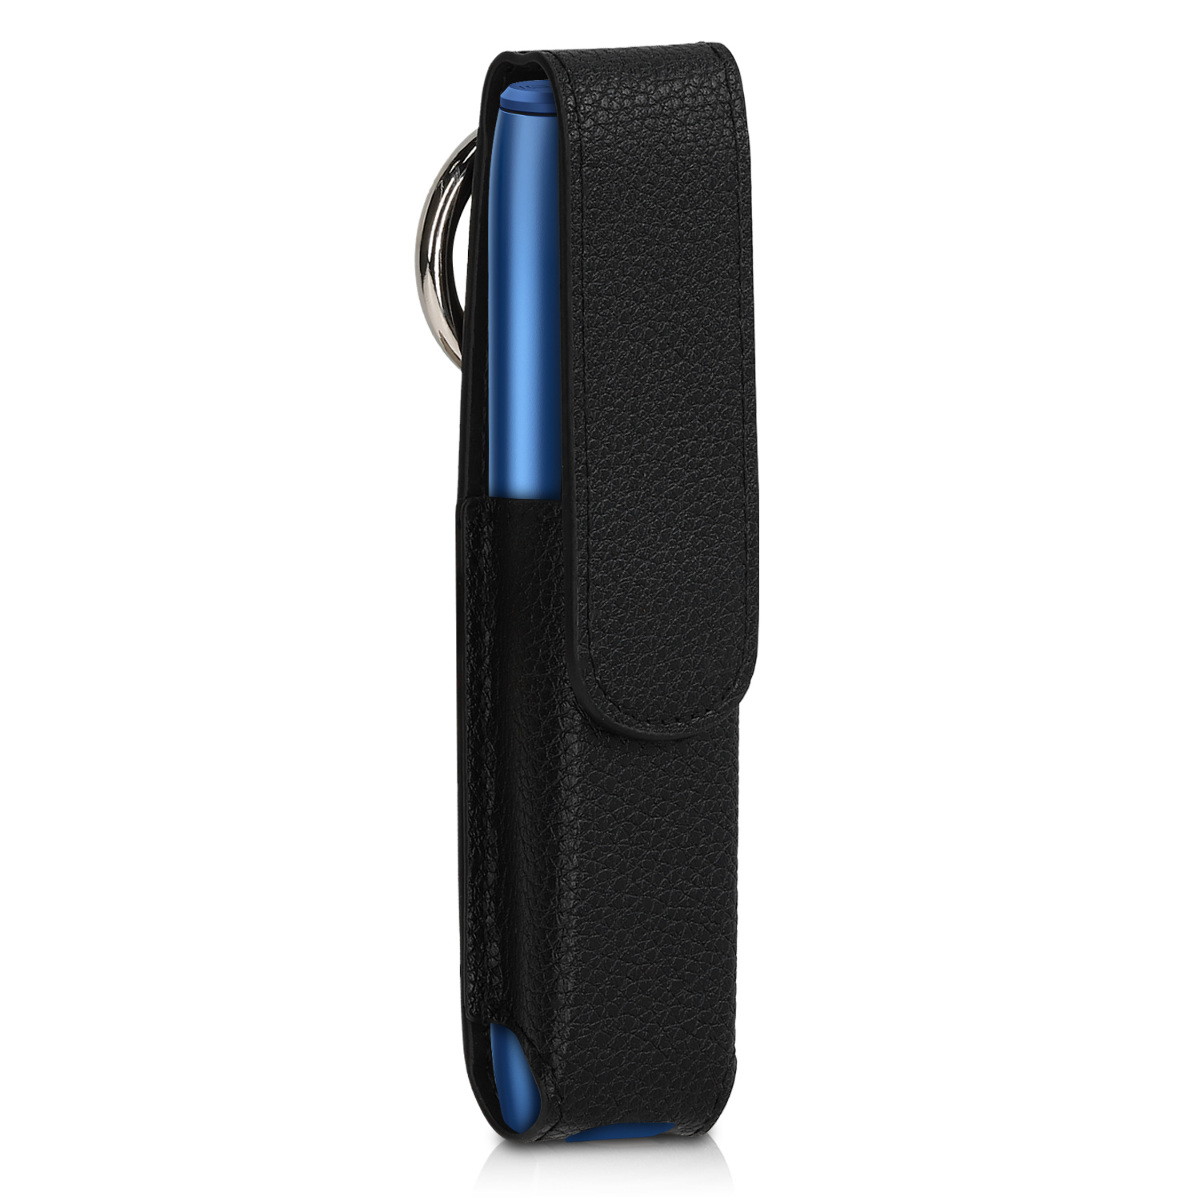 KW Θήκη PU Leather για IQOS 3 Multi - Black (47199.01)